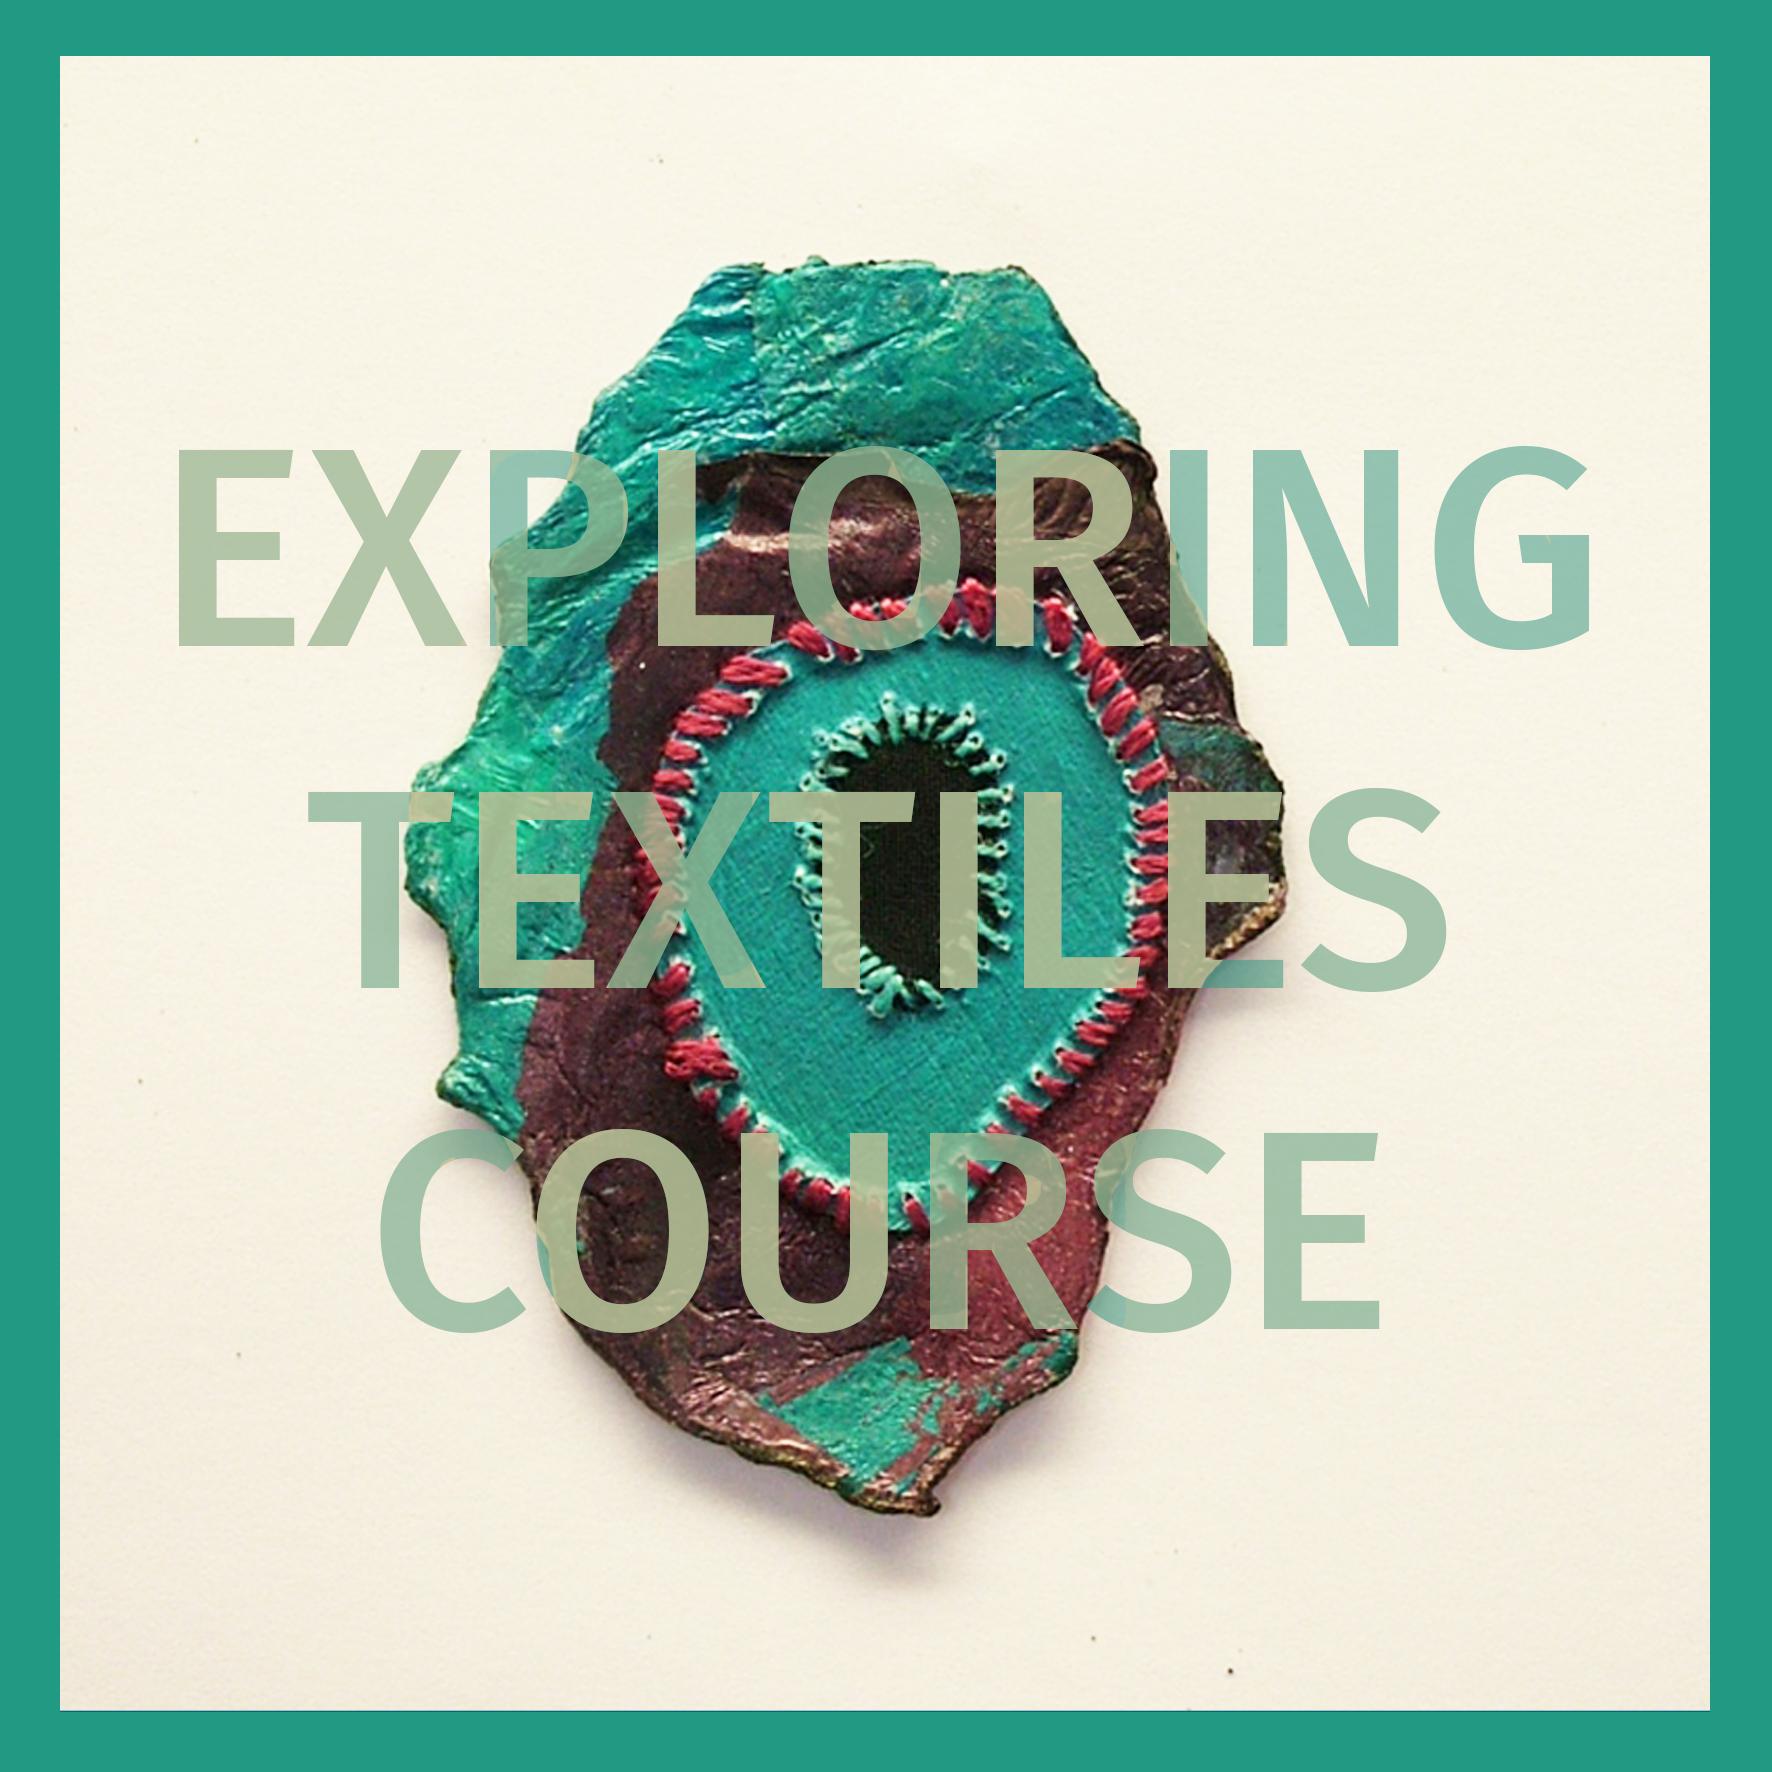 exploring textiles shop image3